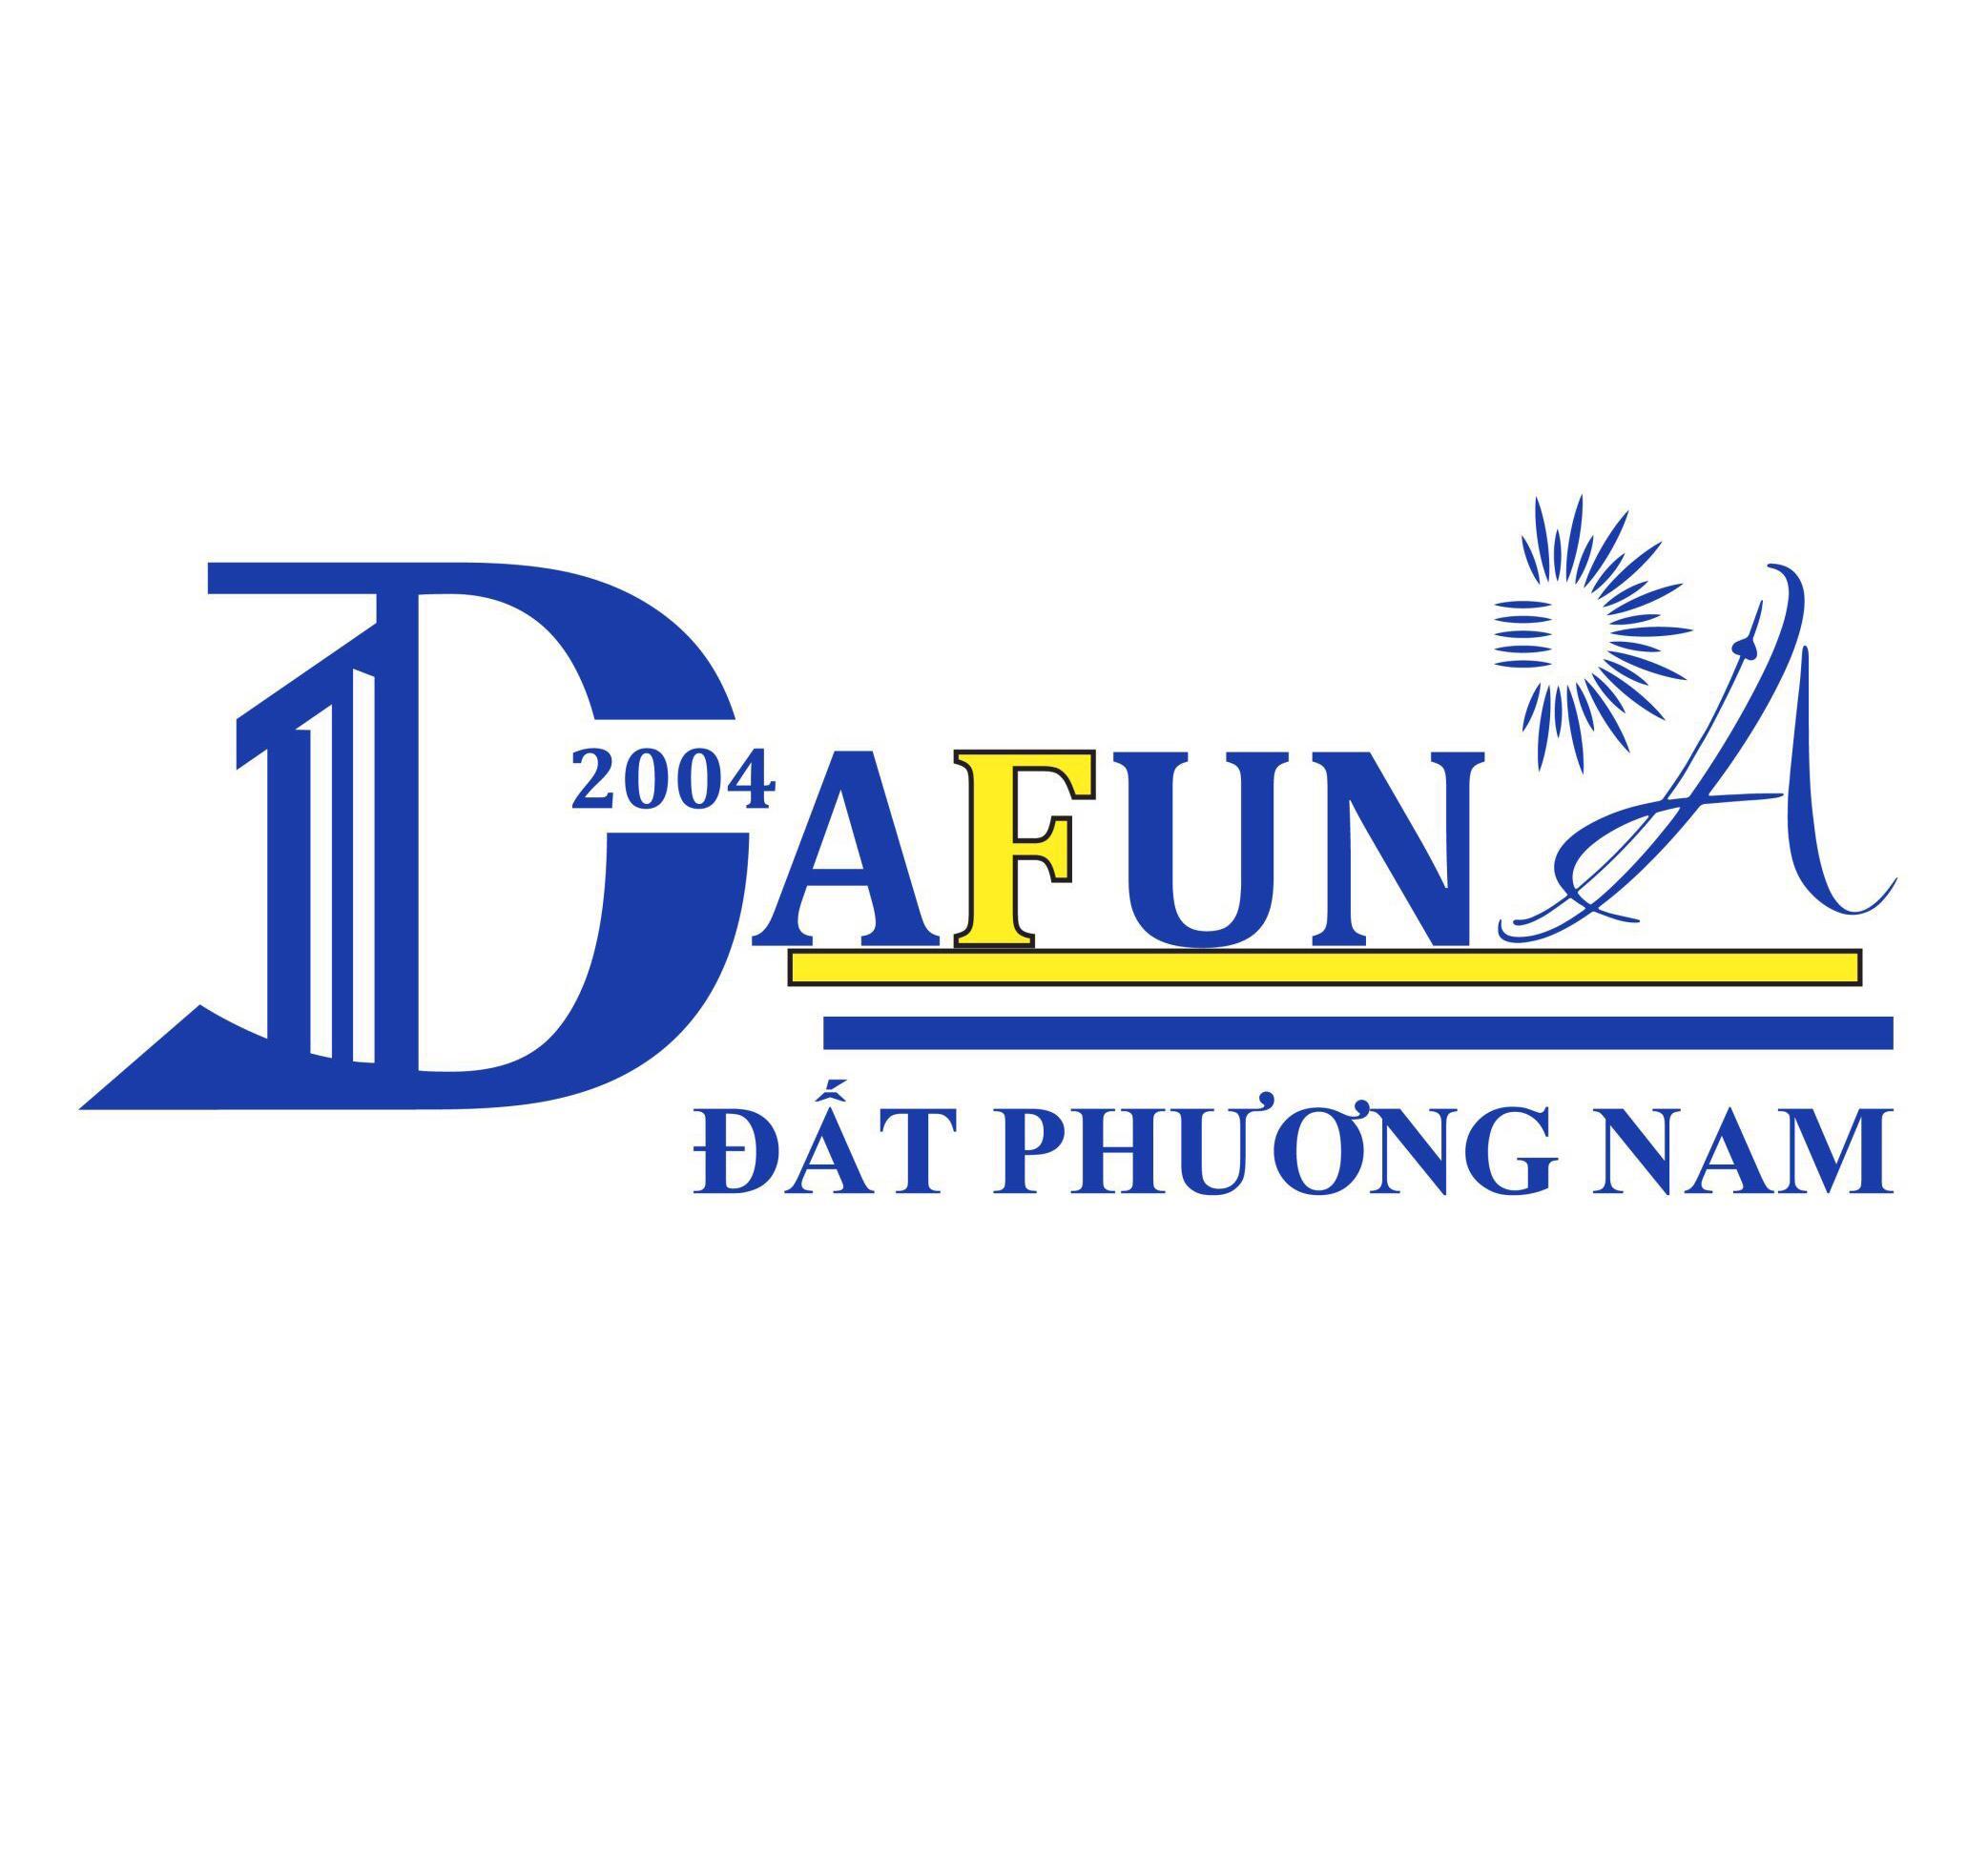 DAFUNA SERVICES